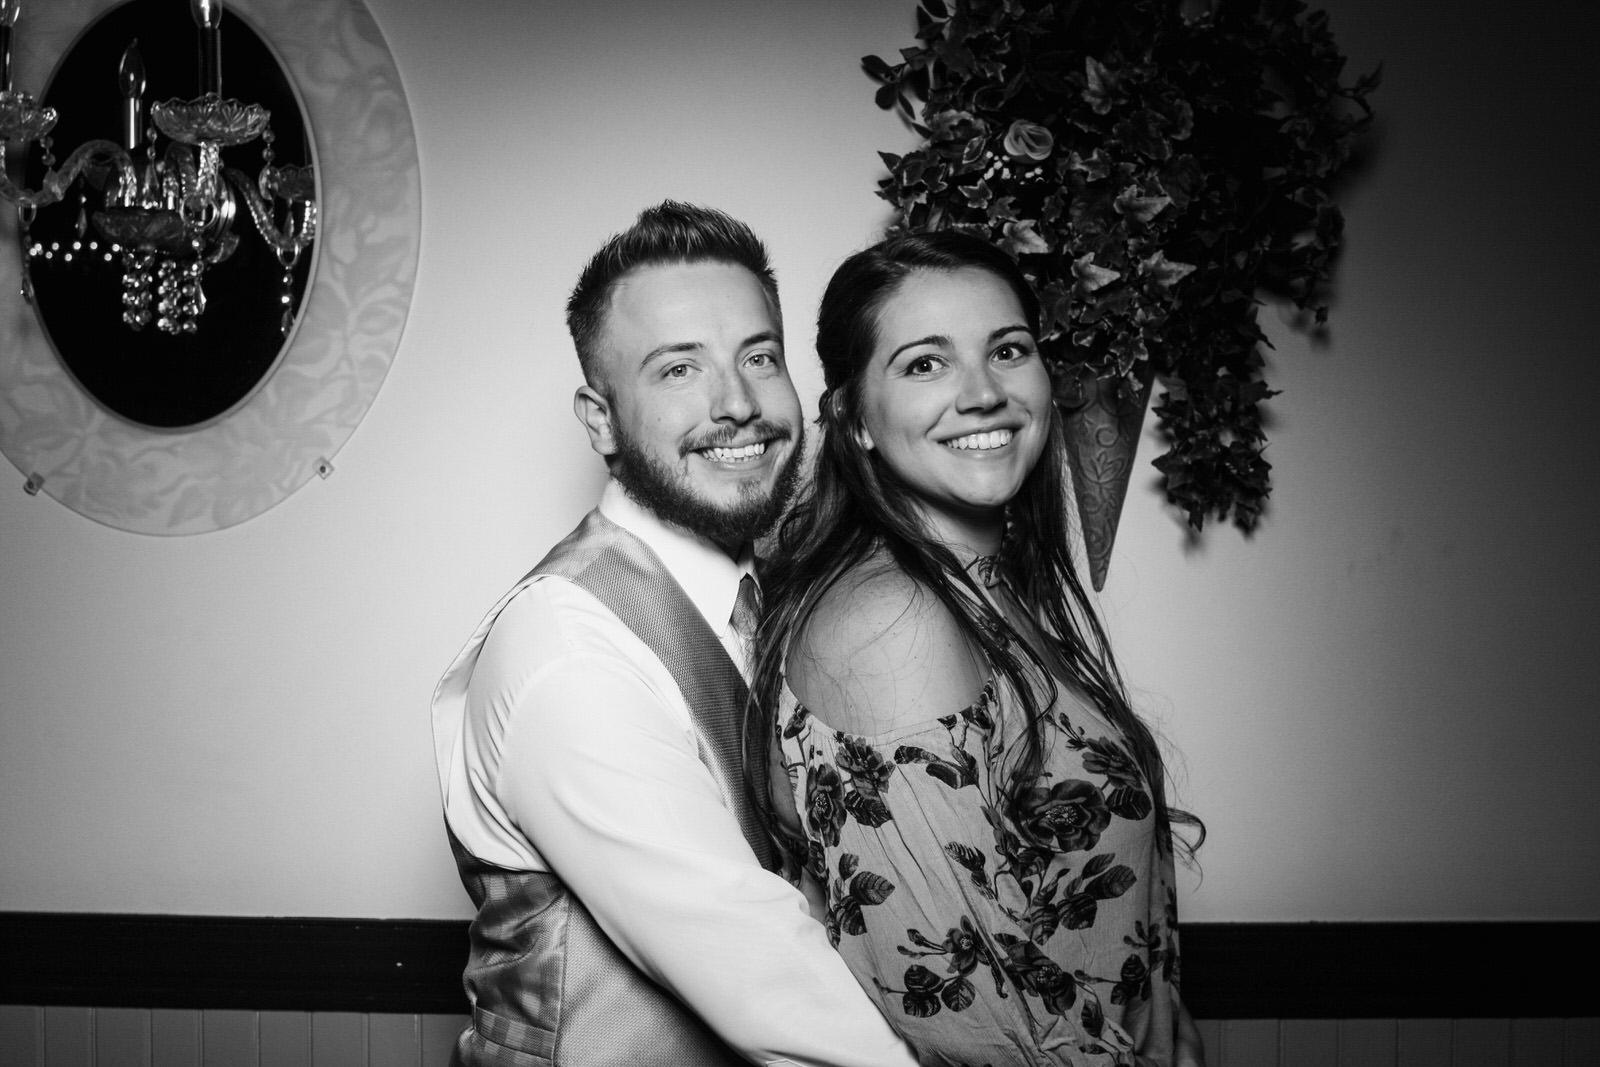 Ryan-Christine-Wedding-Photo-Booth-1.jpg